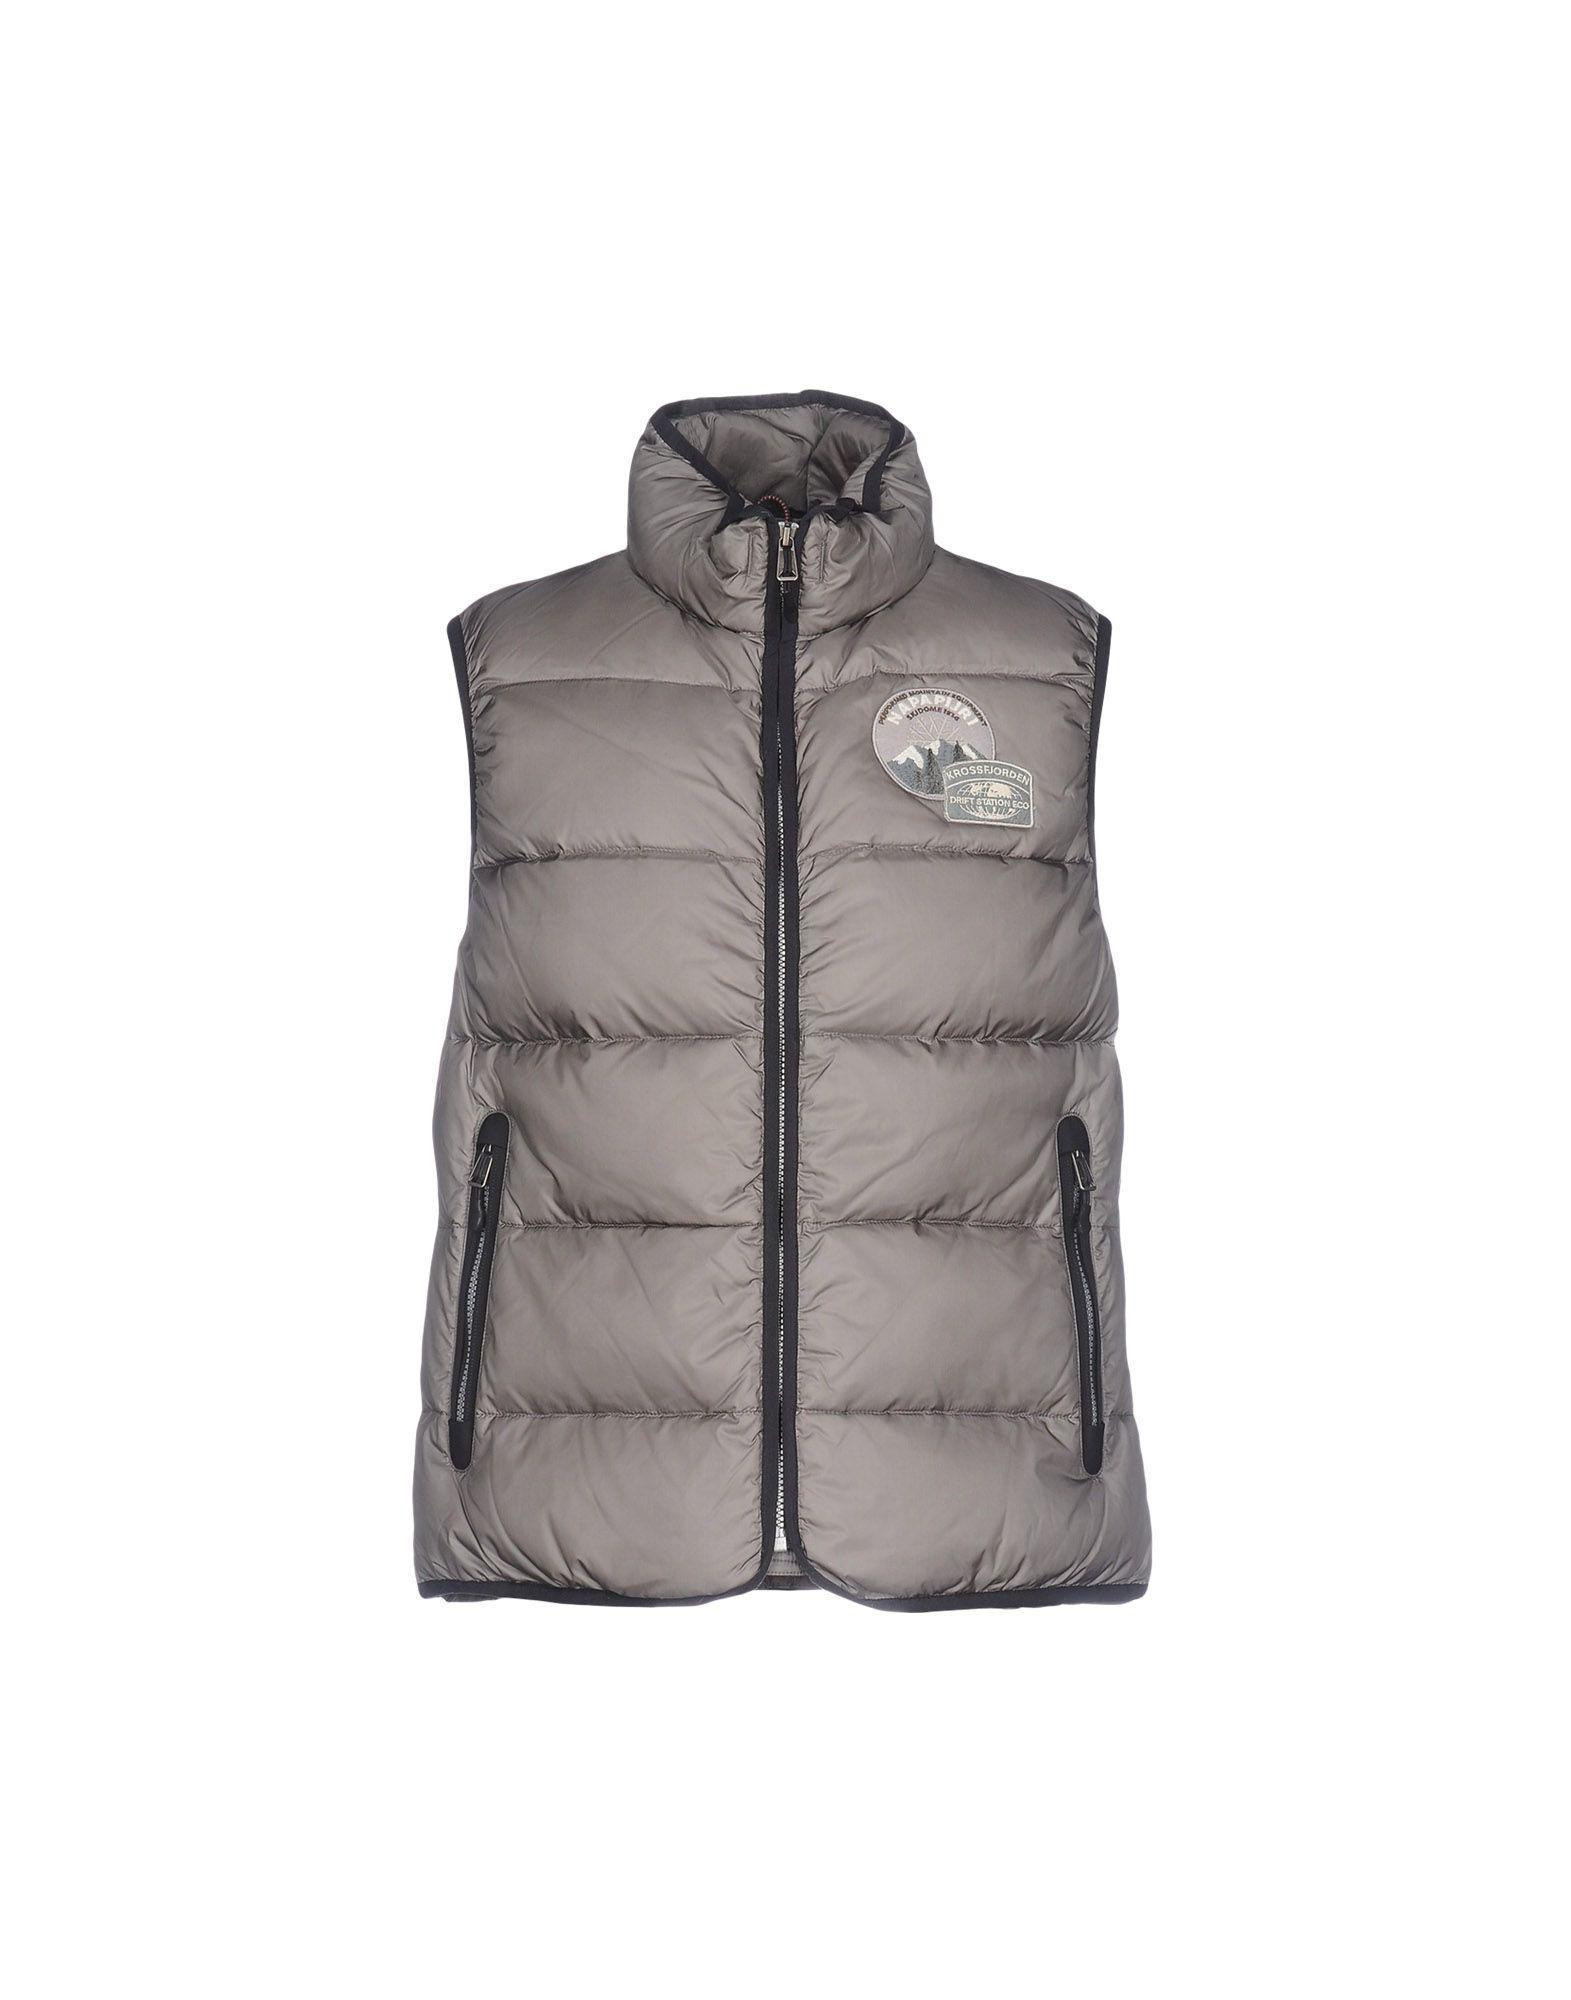 Napapijri Down Jacket In Grey